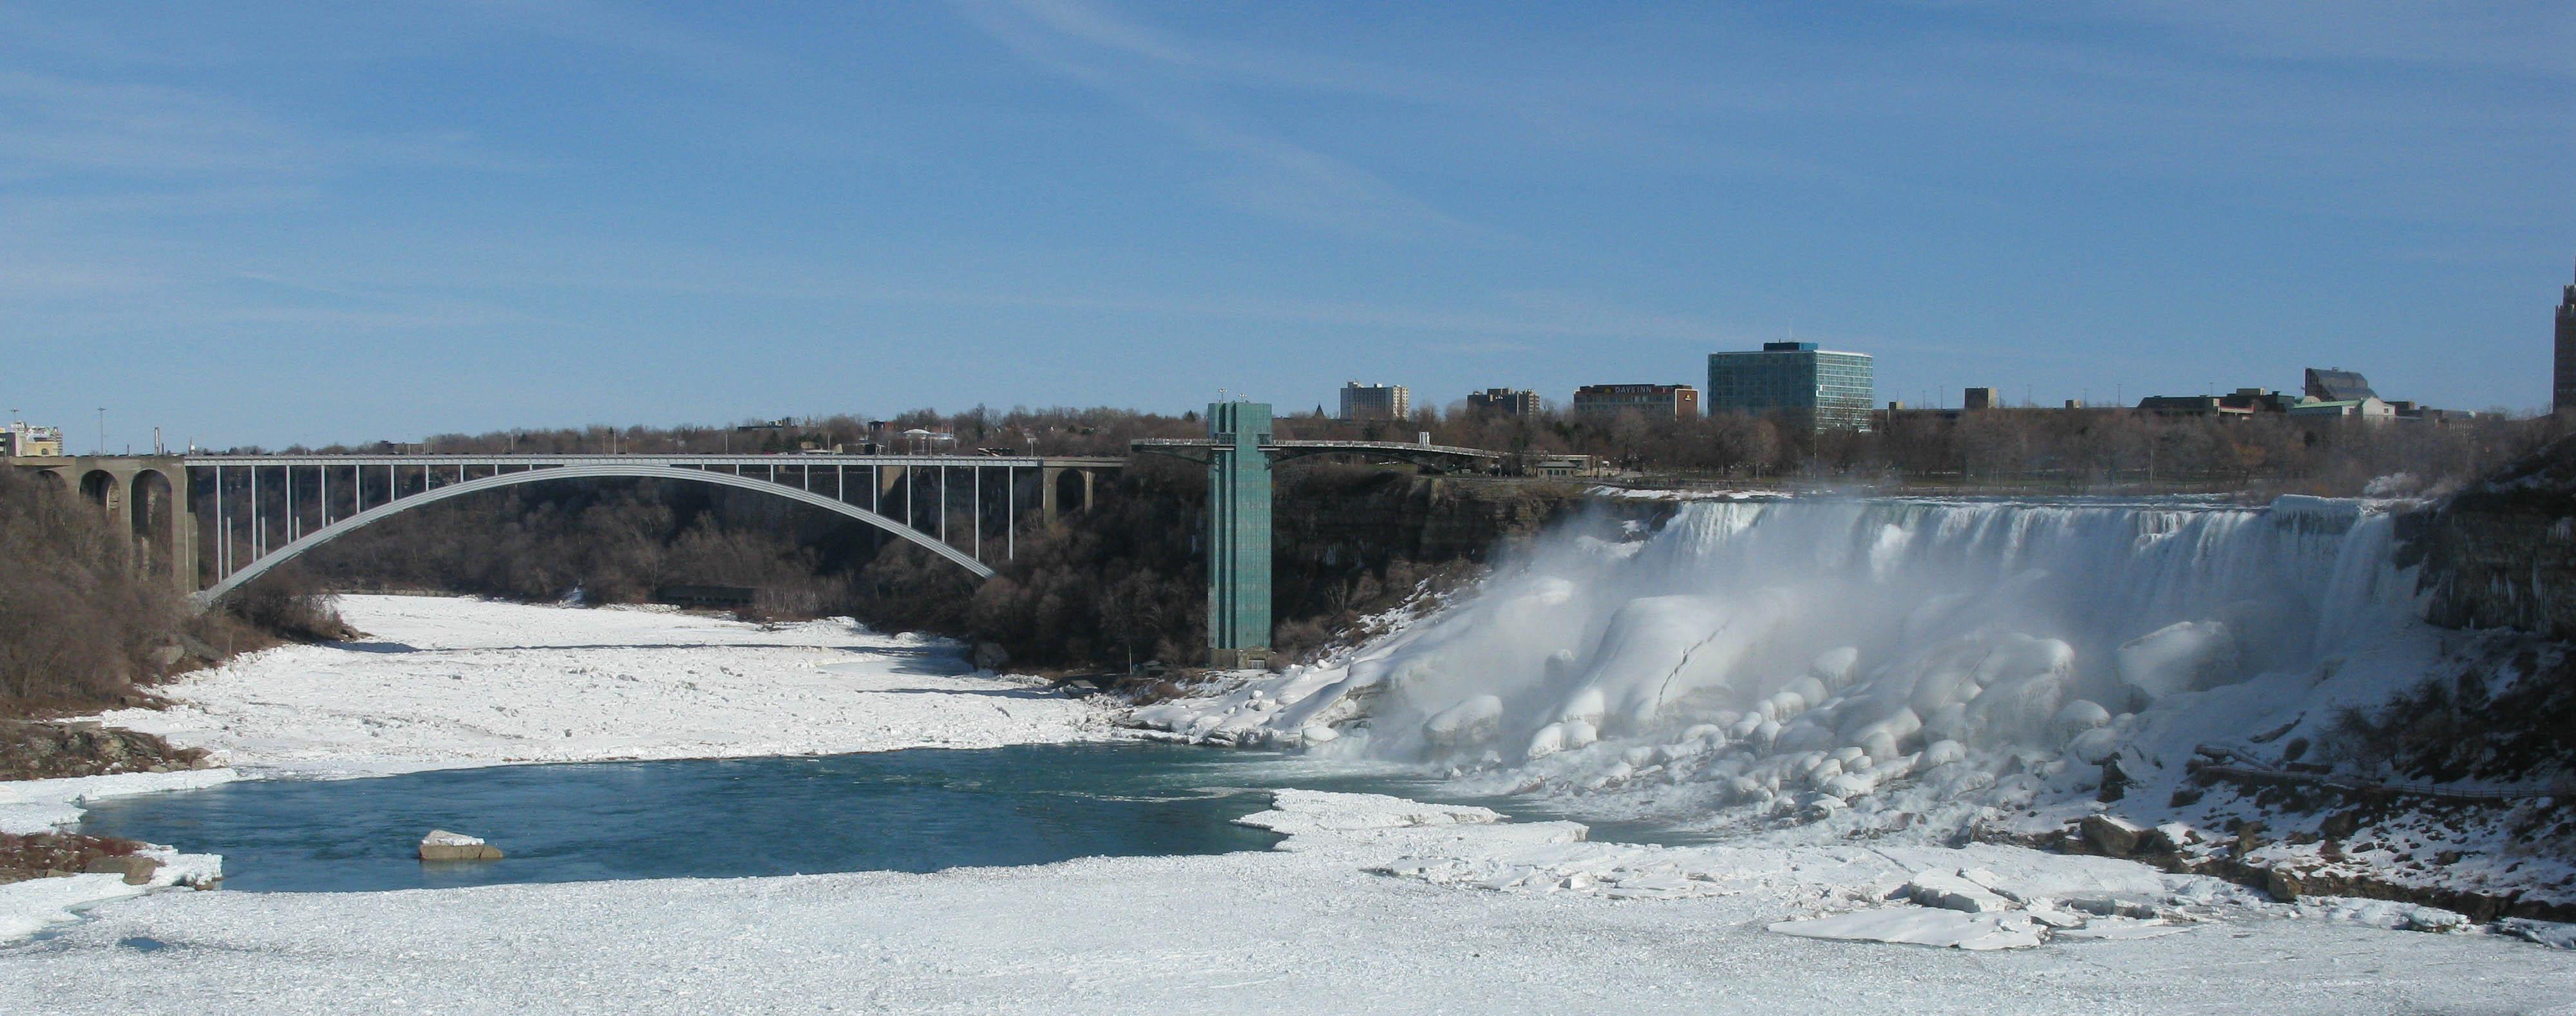 Frozen Niagara River and the American Falls